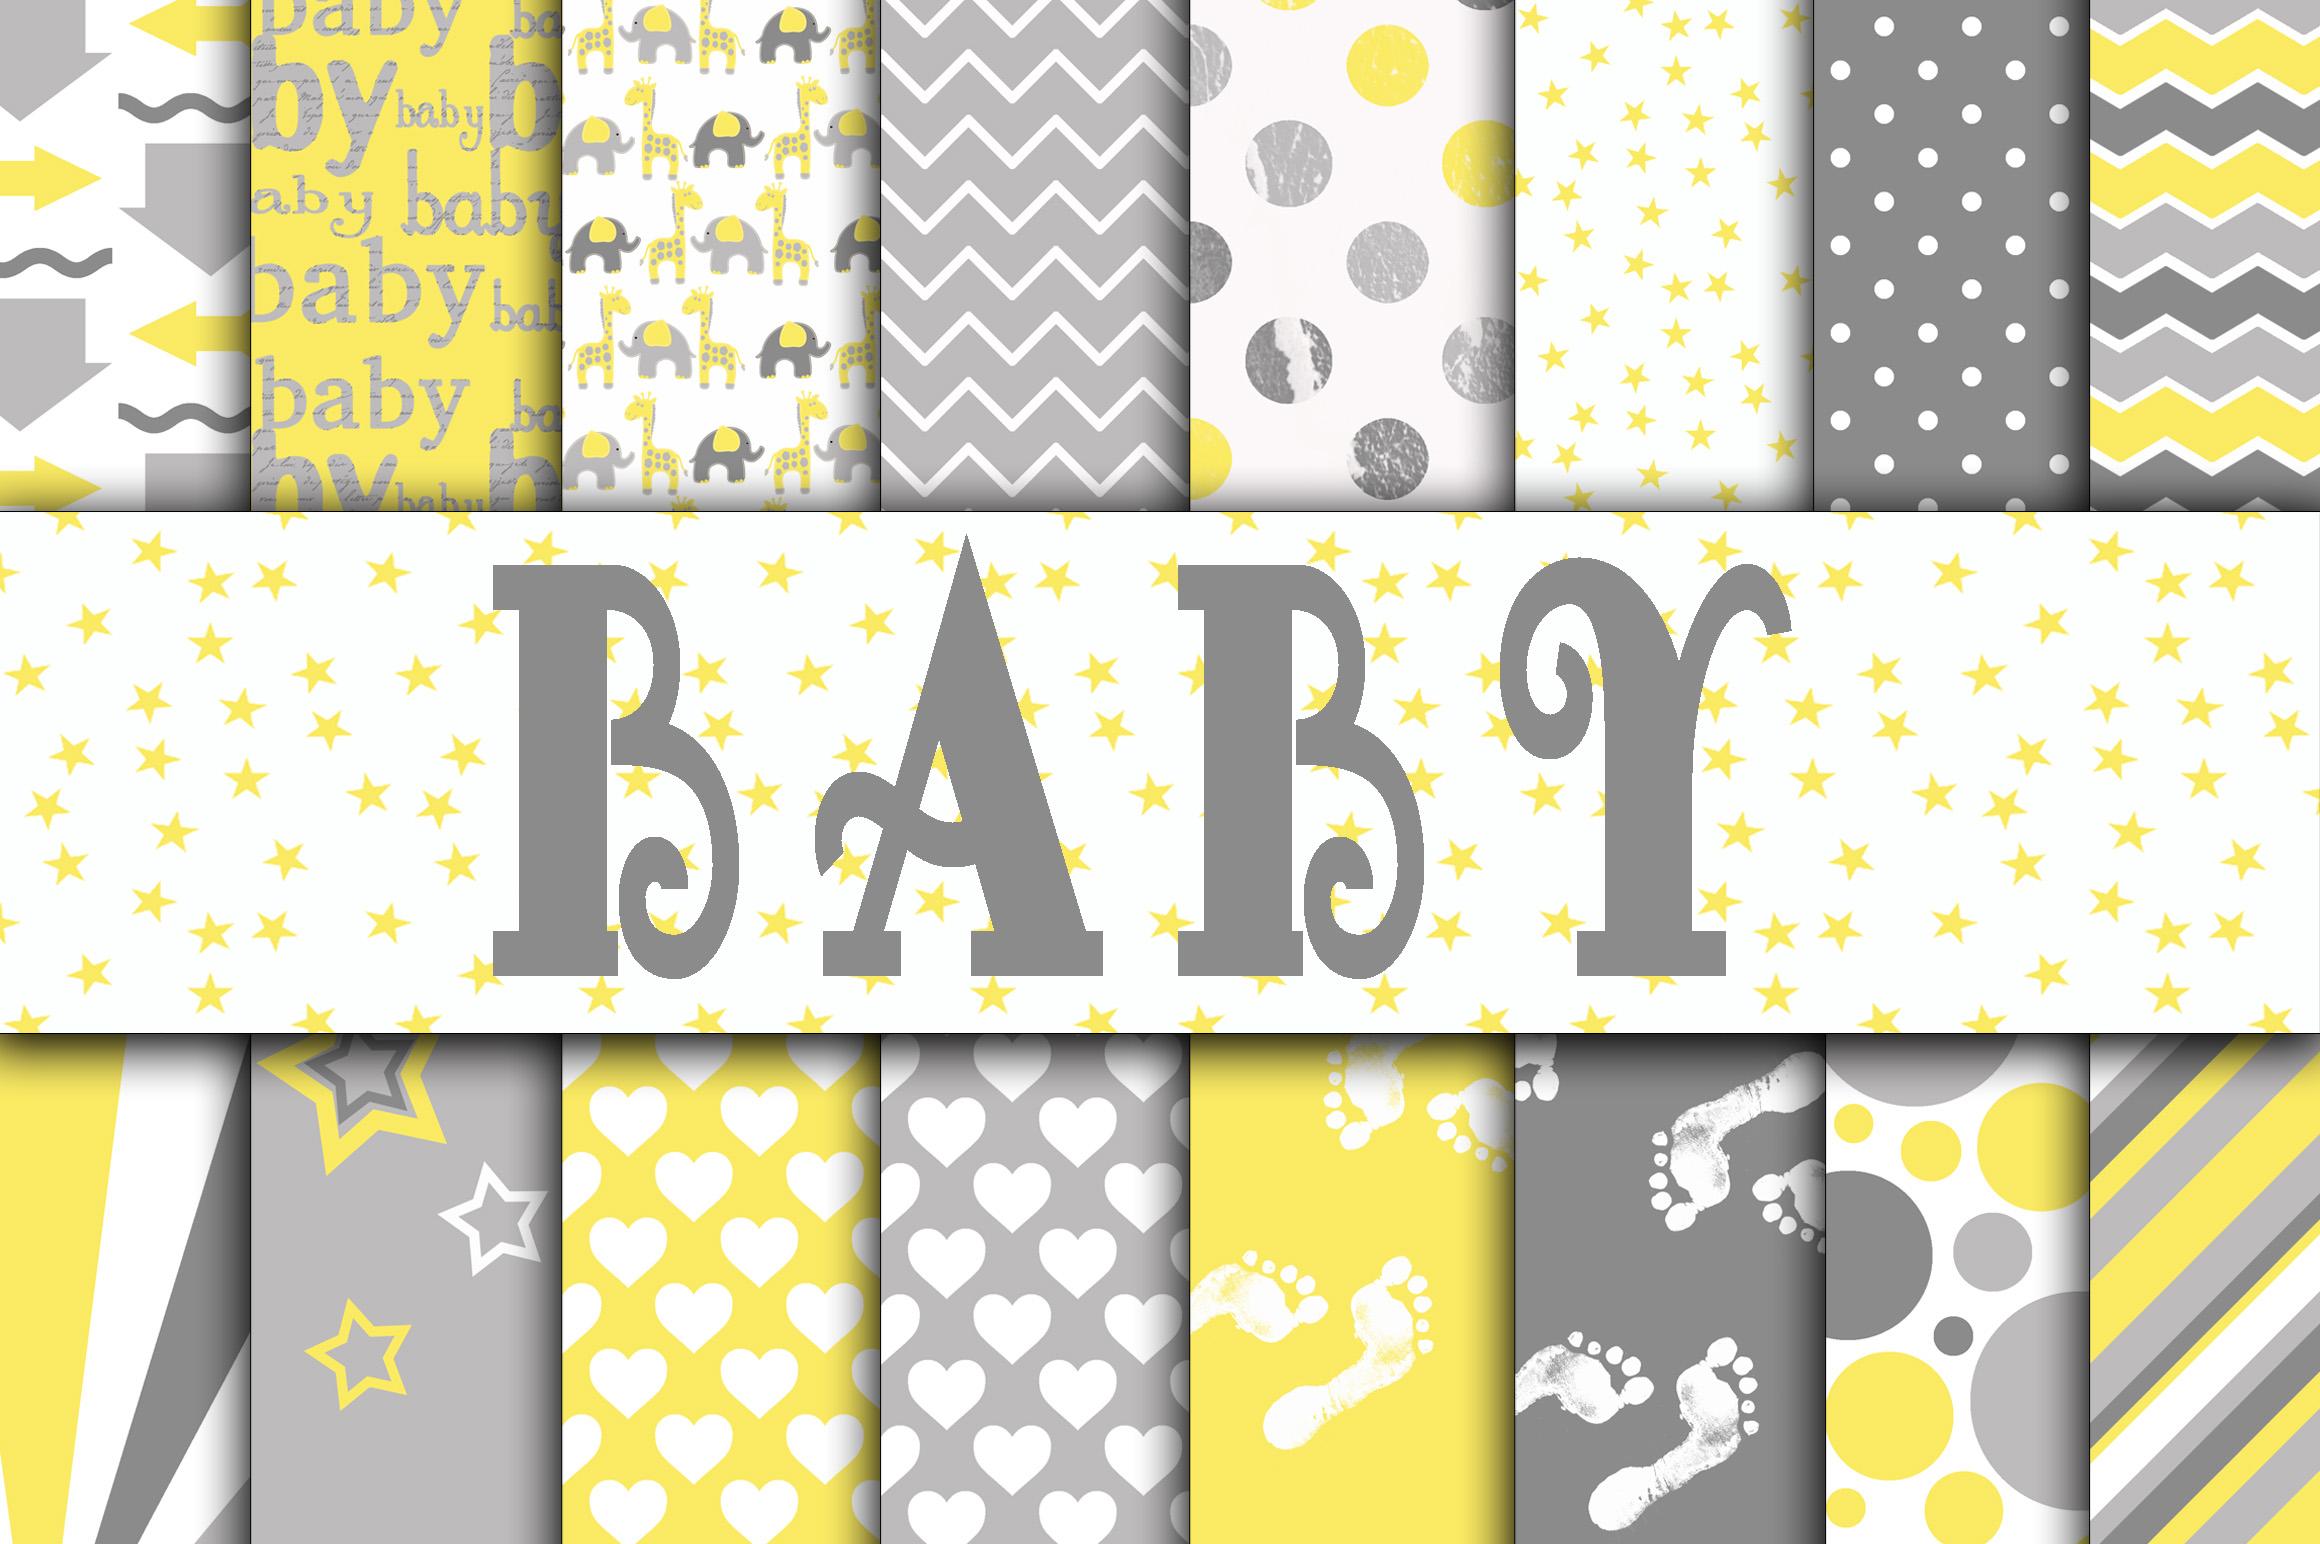 Digital Textures Scrapbook Paper Bundle - Over 250 Sets! example image 10